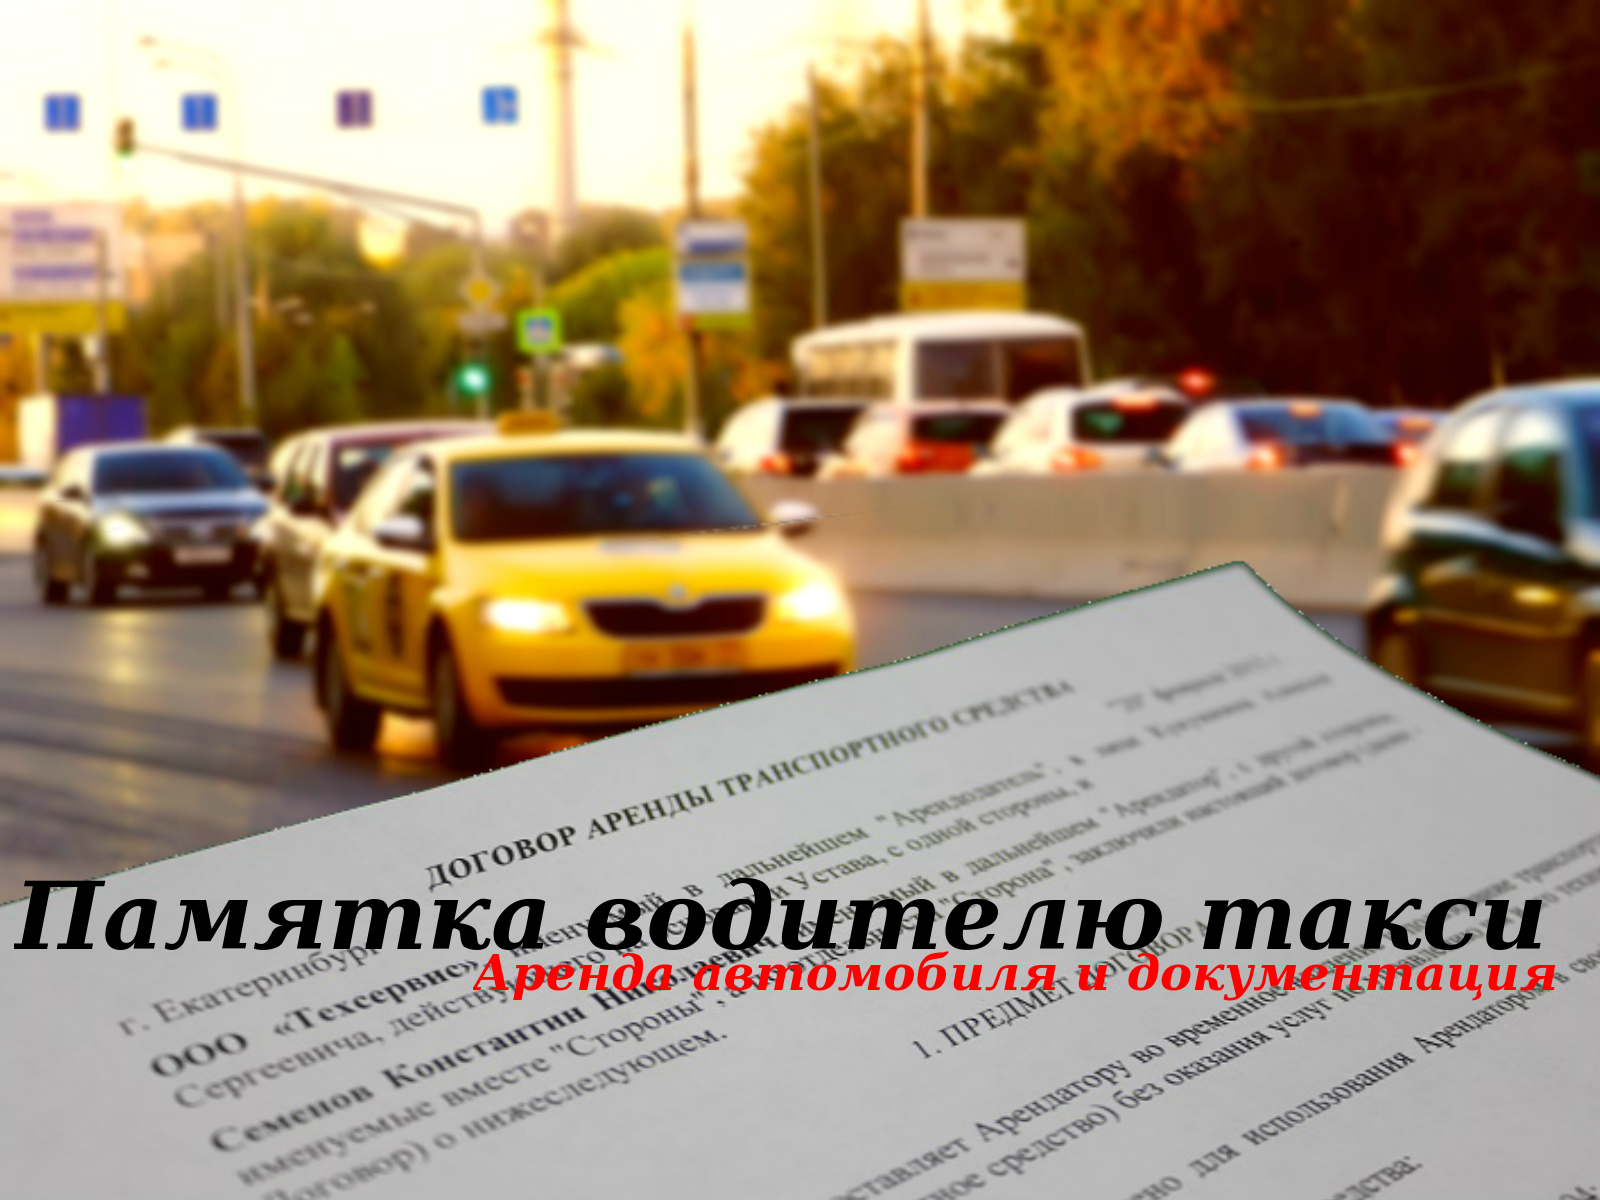 Памятка водителю такси — аренда автомобиля и документация